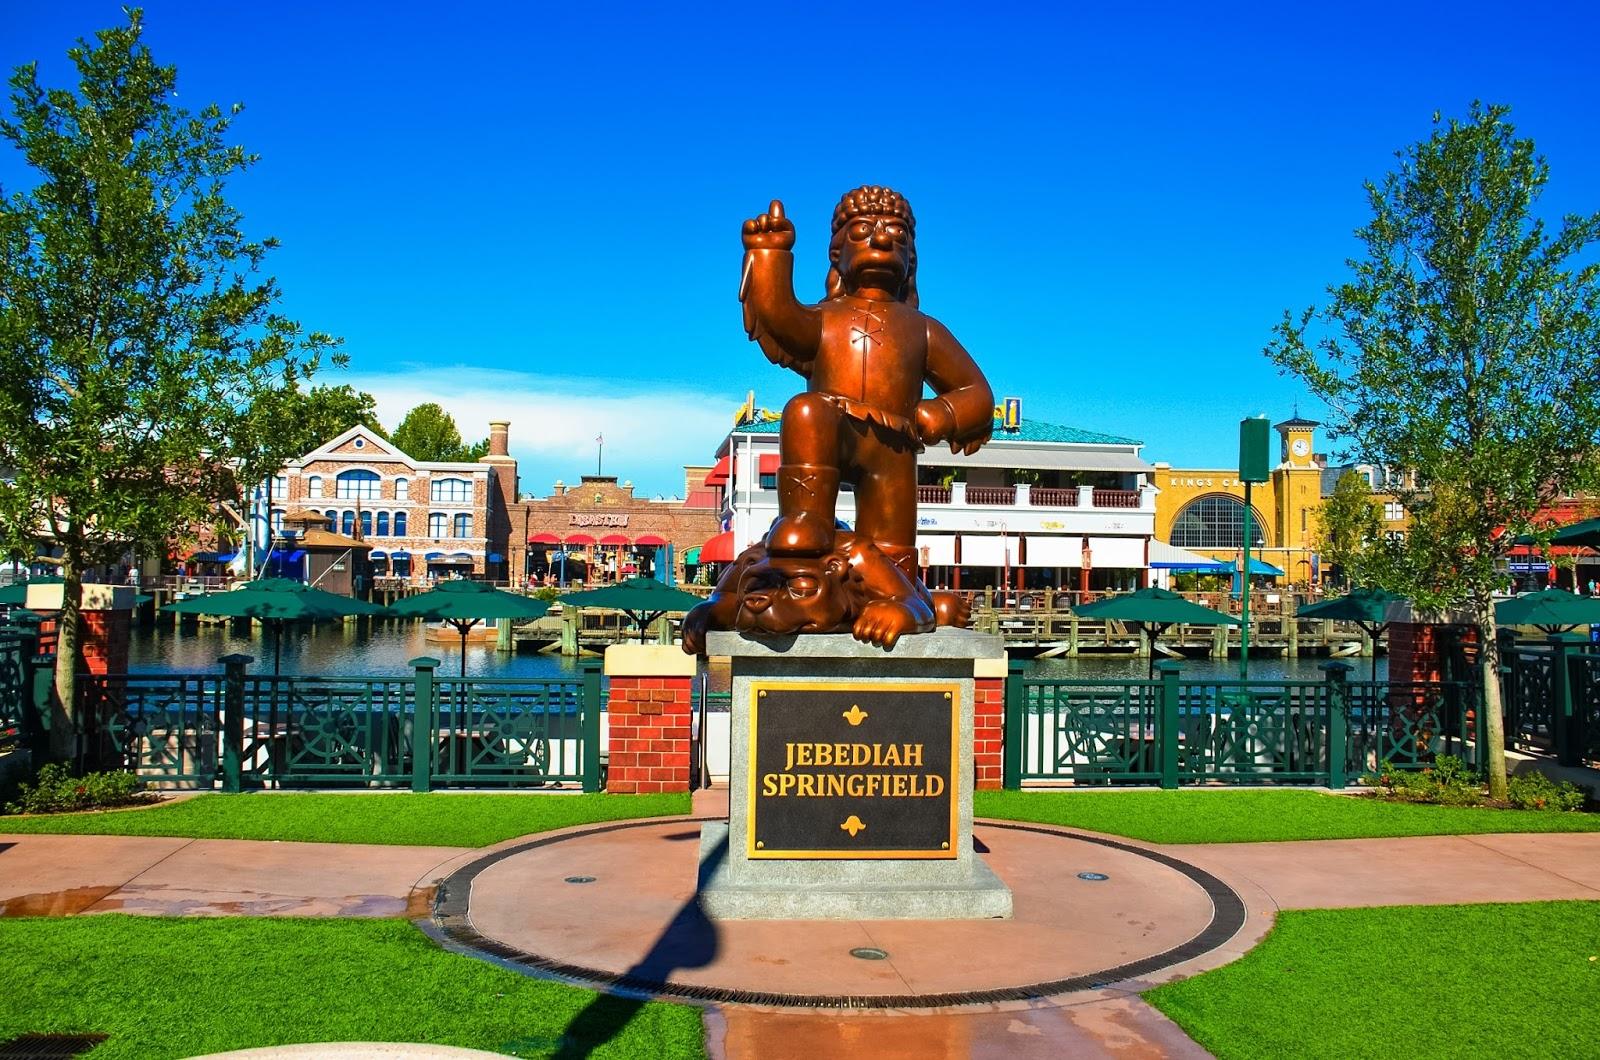 jebediah springfield statue